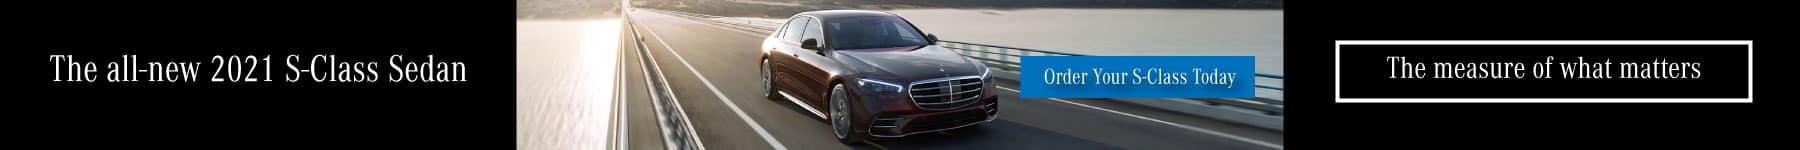 All-new 2021 S-Class Sedan